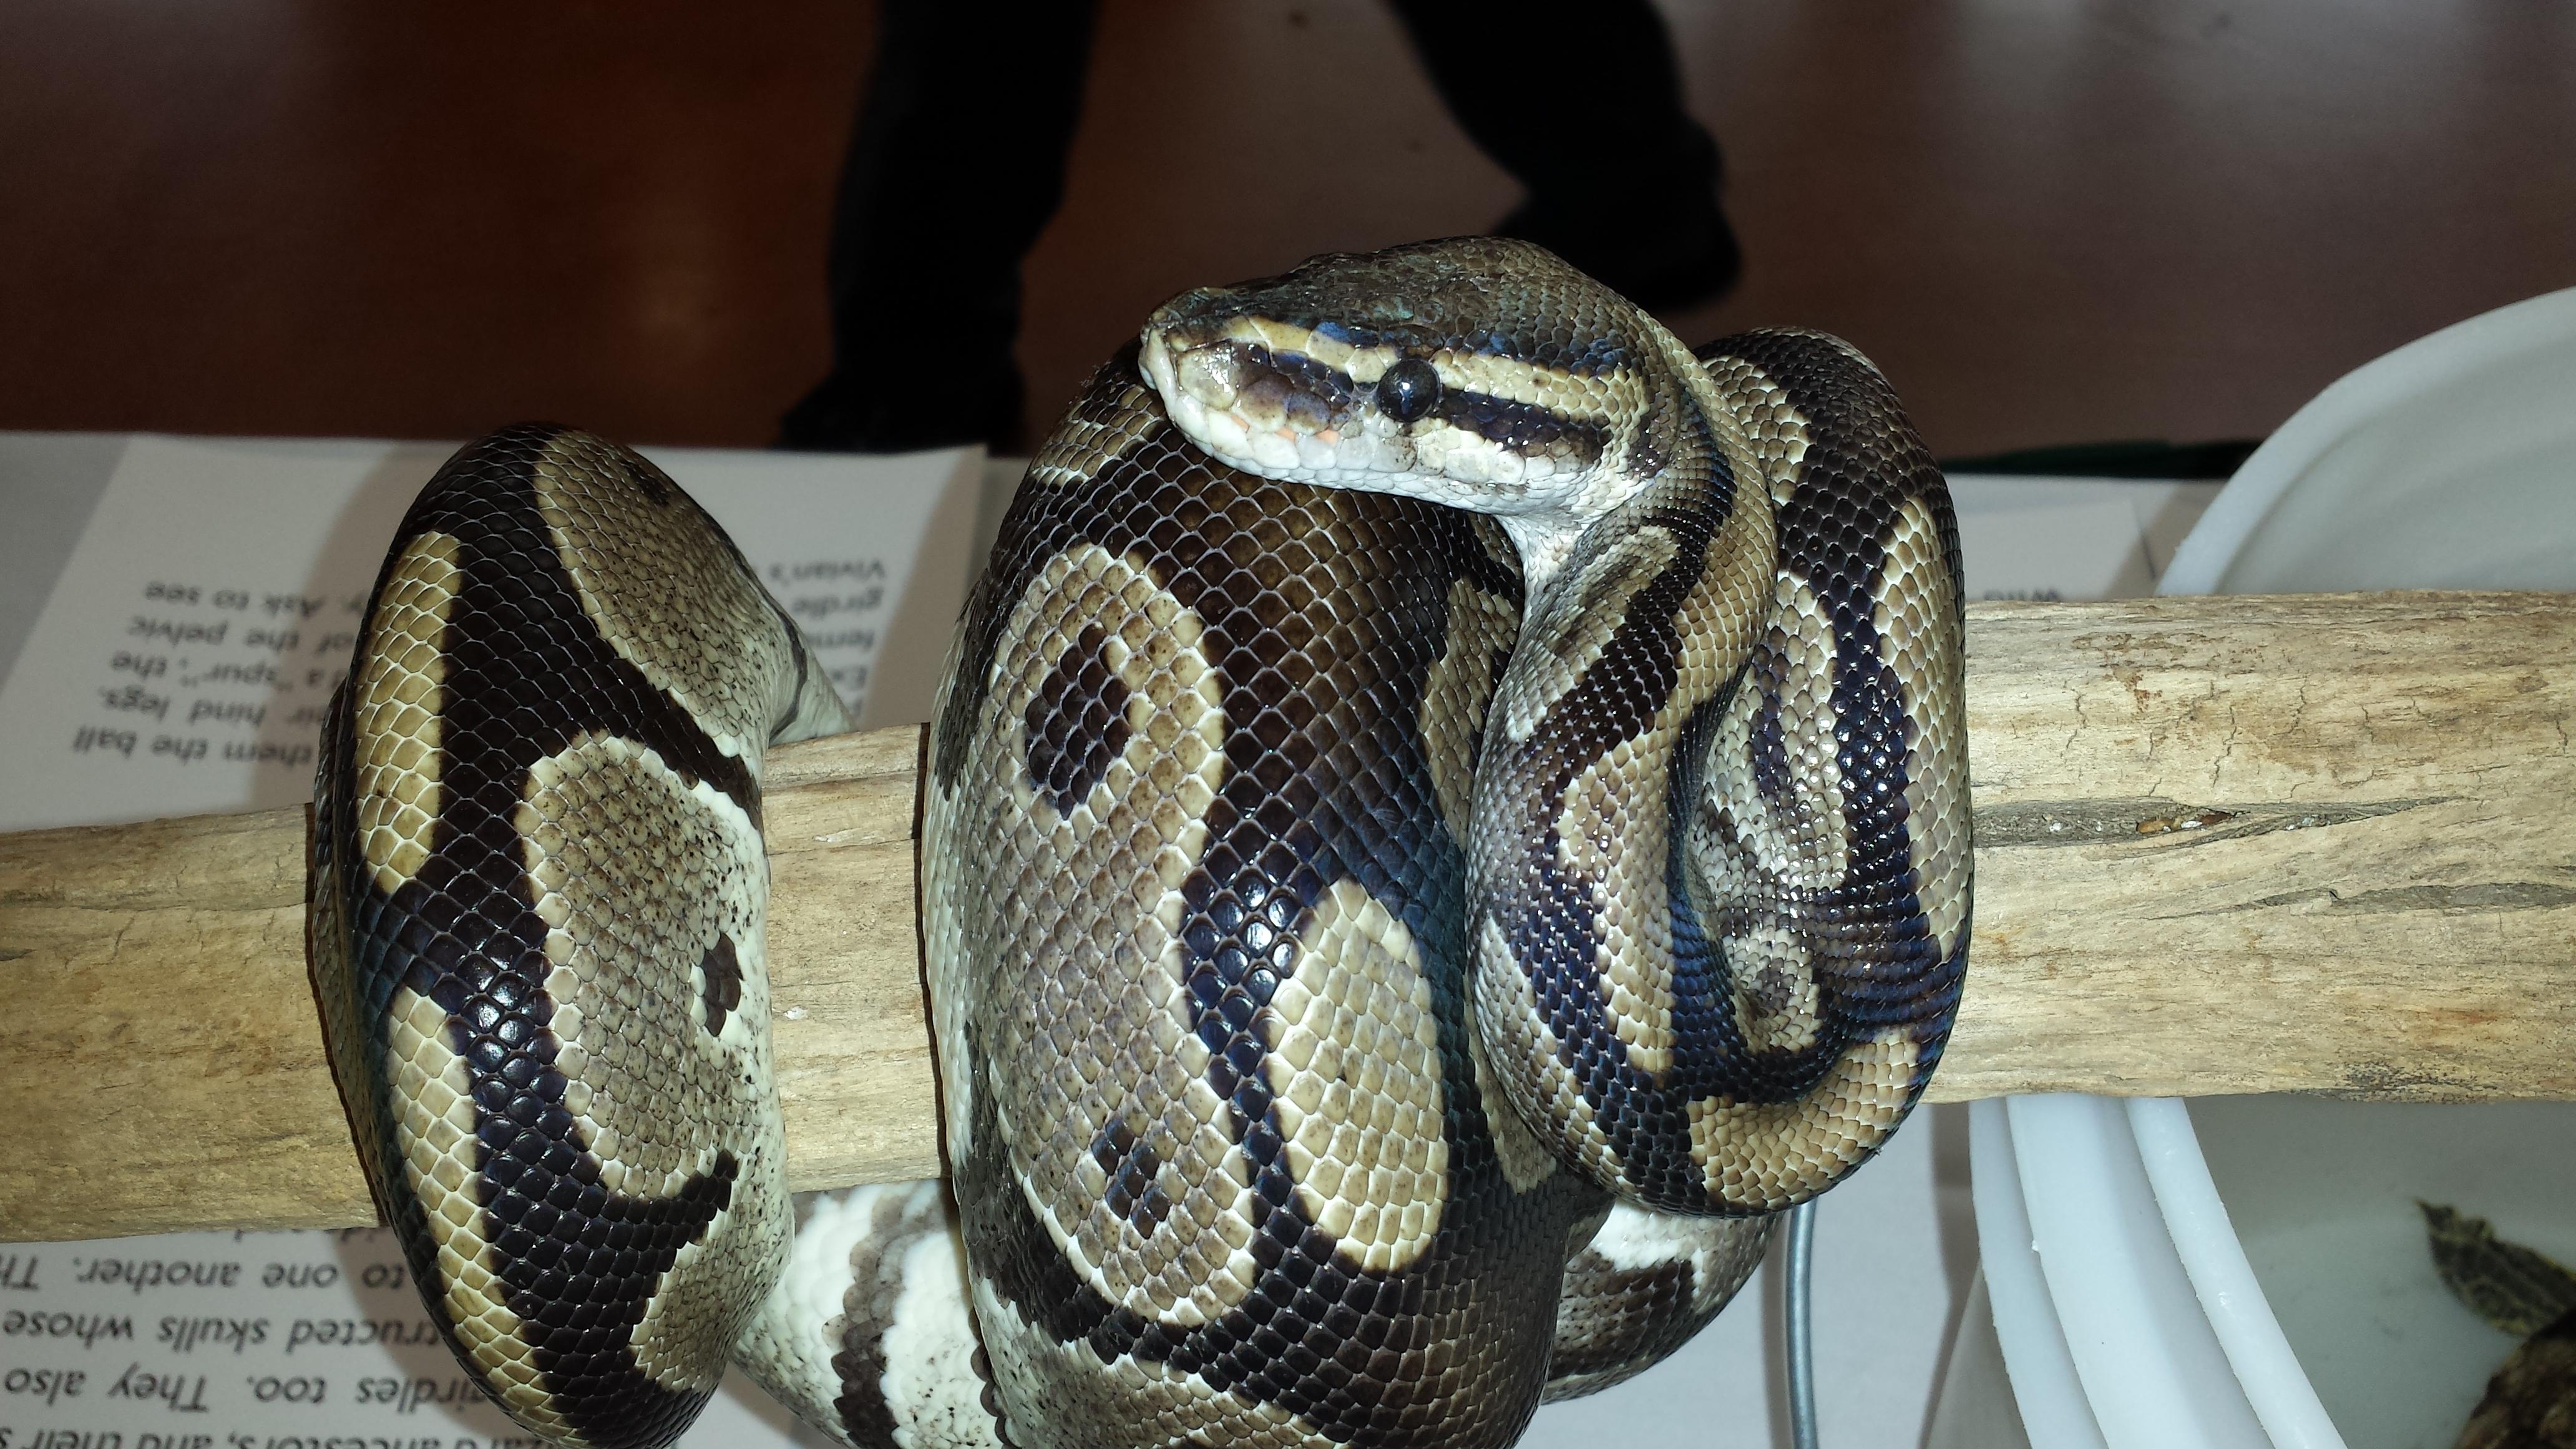 Ball python (Python regius), captive, at alumni event at UW-Prakside, September, 2016.